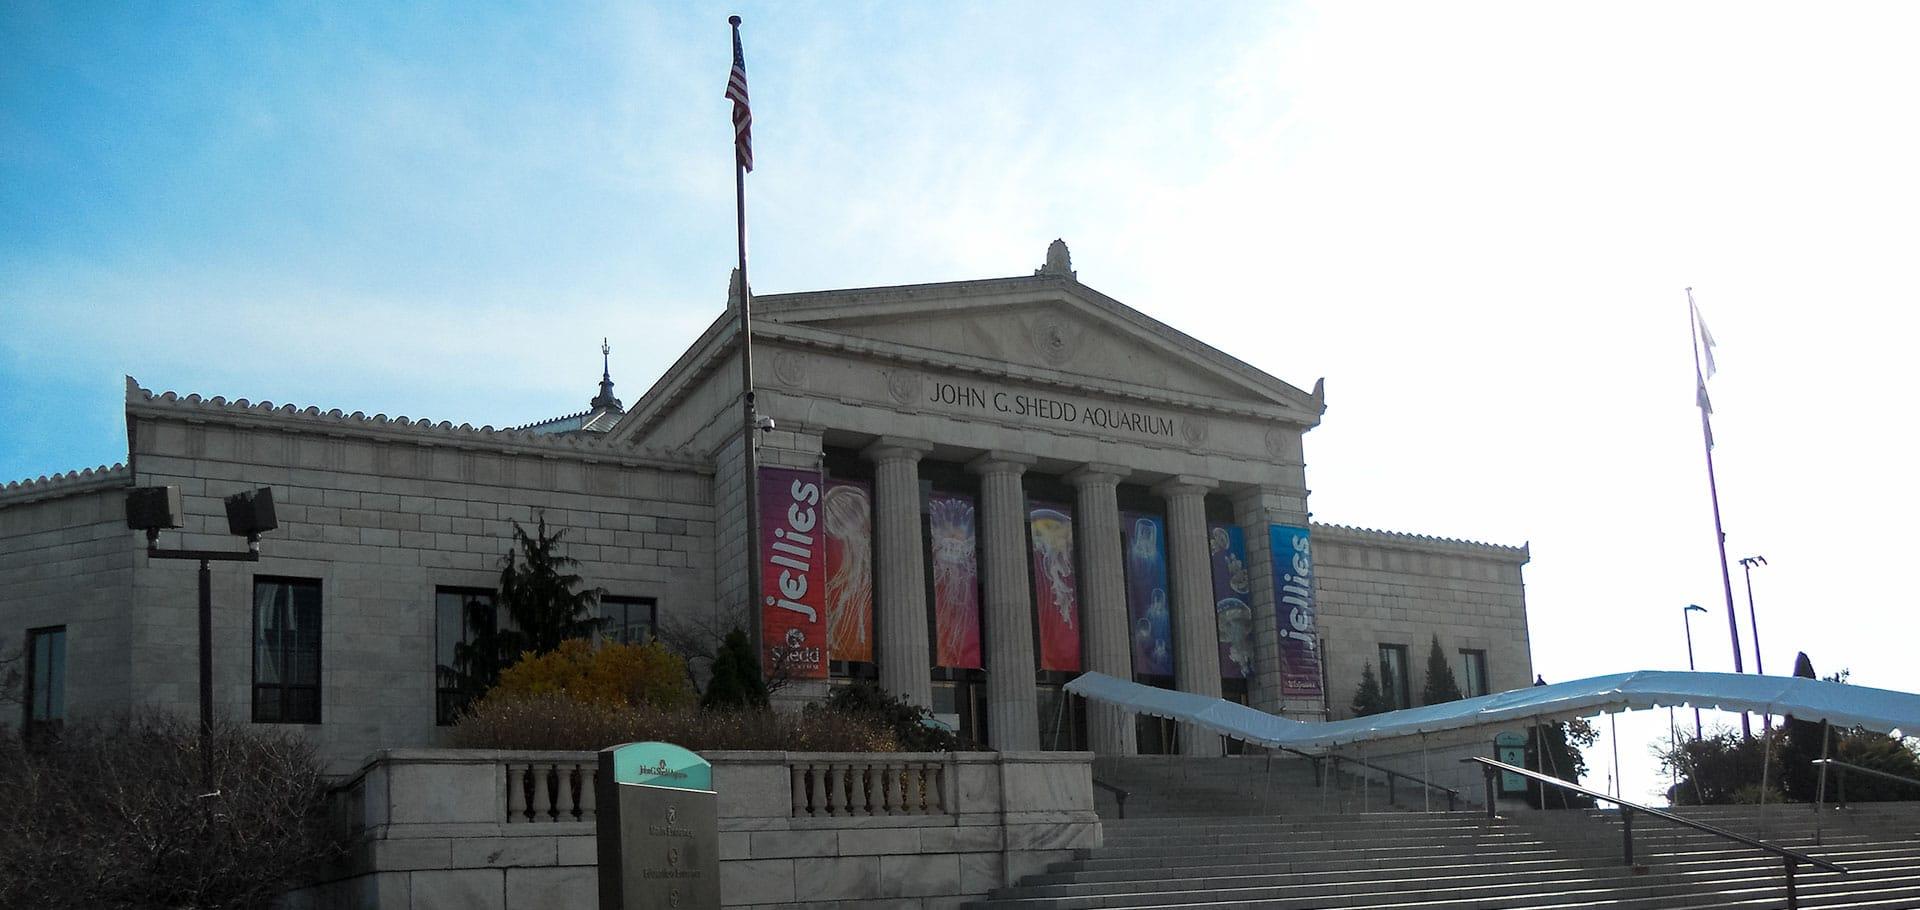 John G. Shedd Aquarium